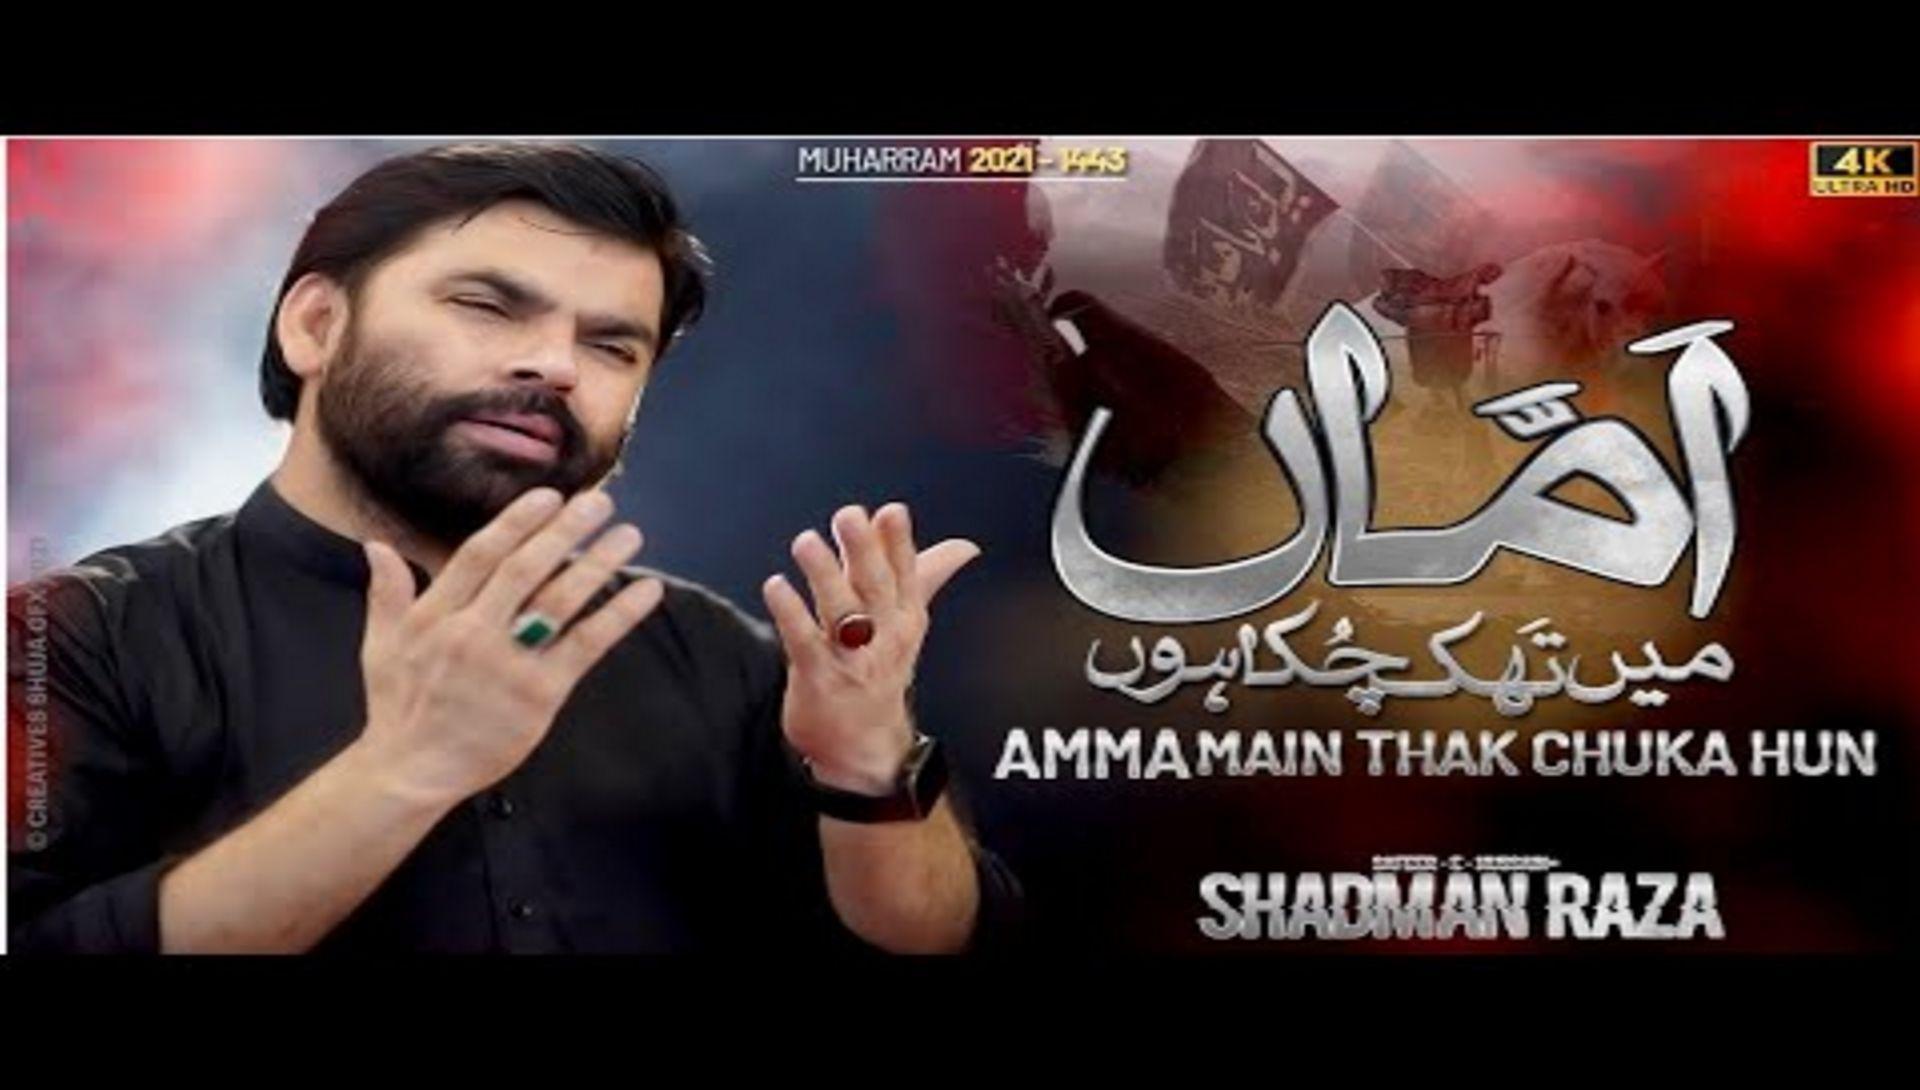 Amma Mein Thak Chuka Hun| Shadman Raza Naqvi New Nohay 2021 | New Nohay 1443-2021 Ayame Aza